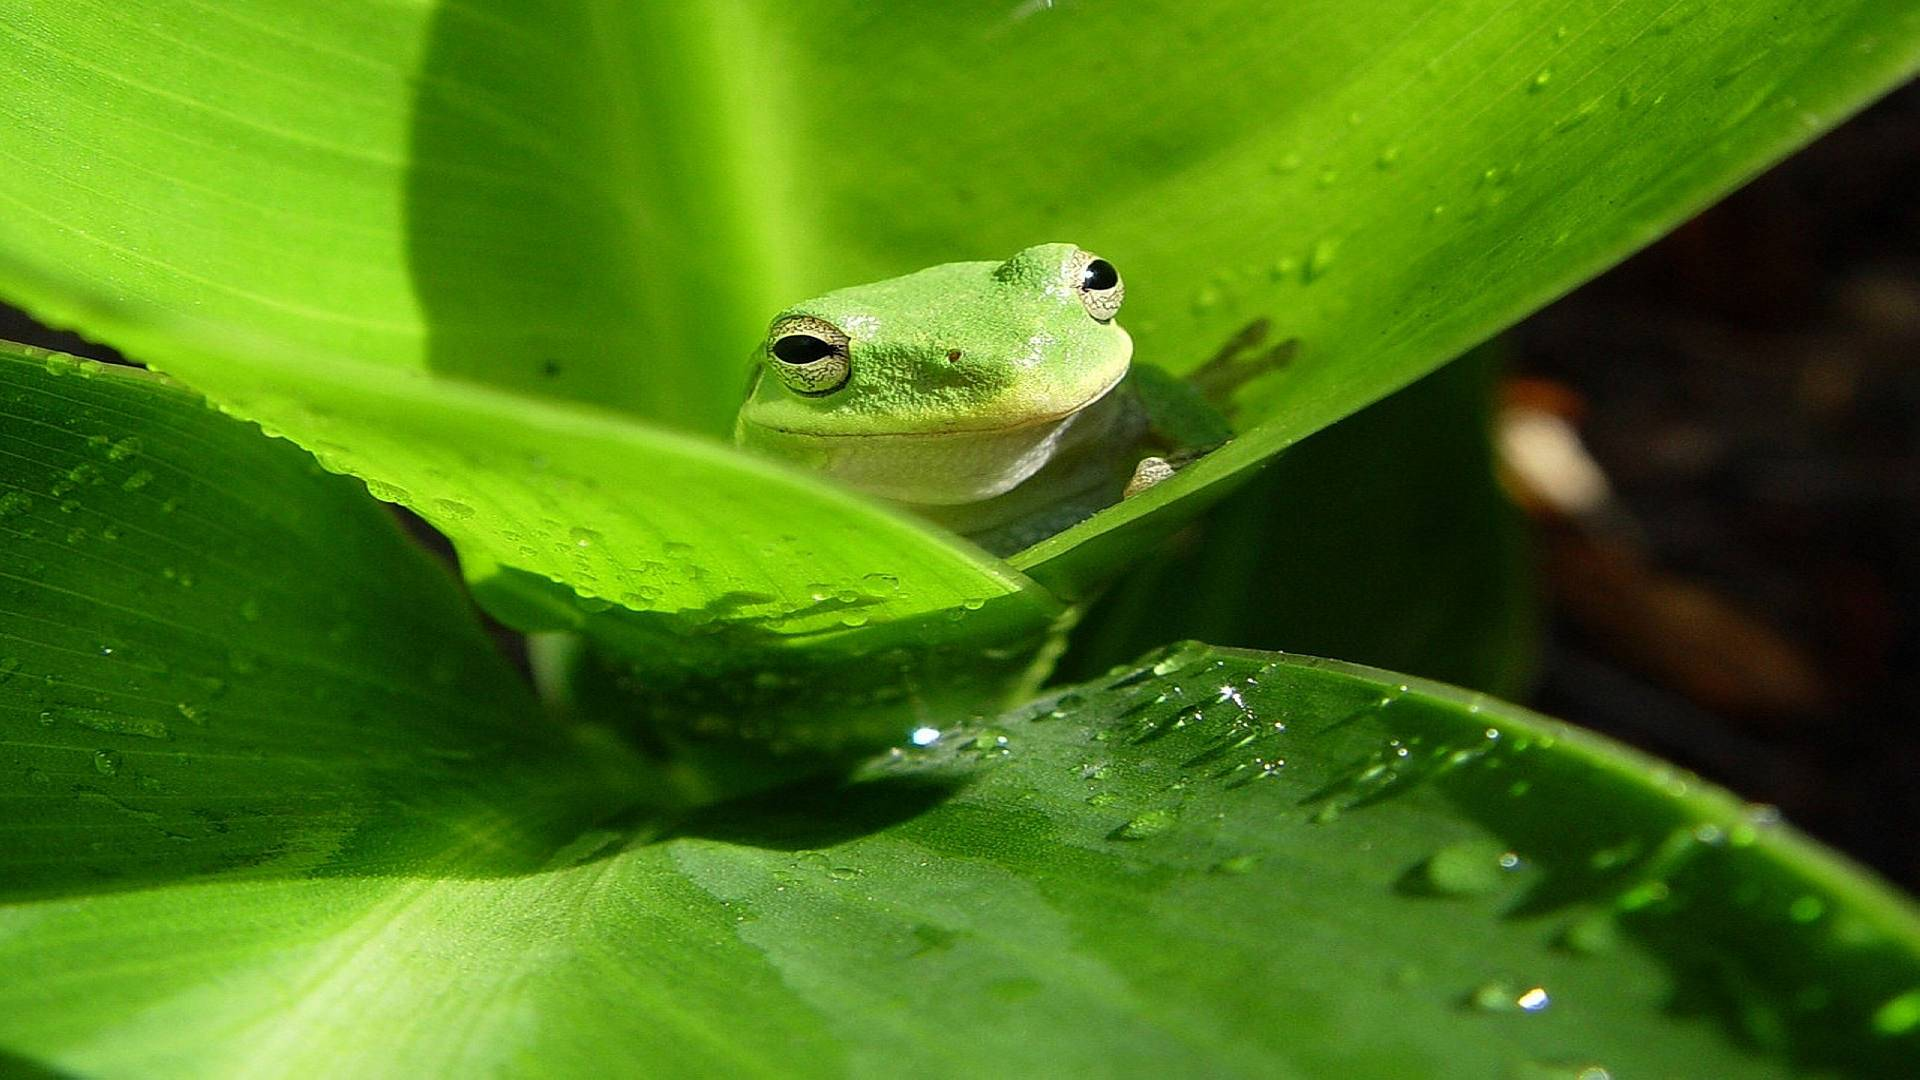 Frog HD Wallpapers Wallpaper